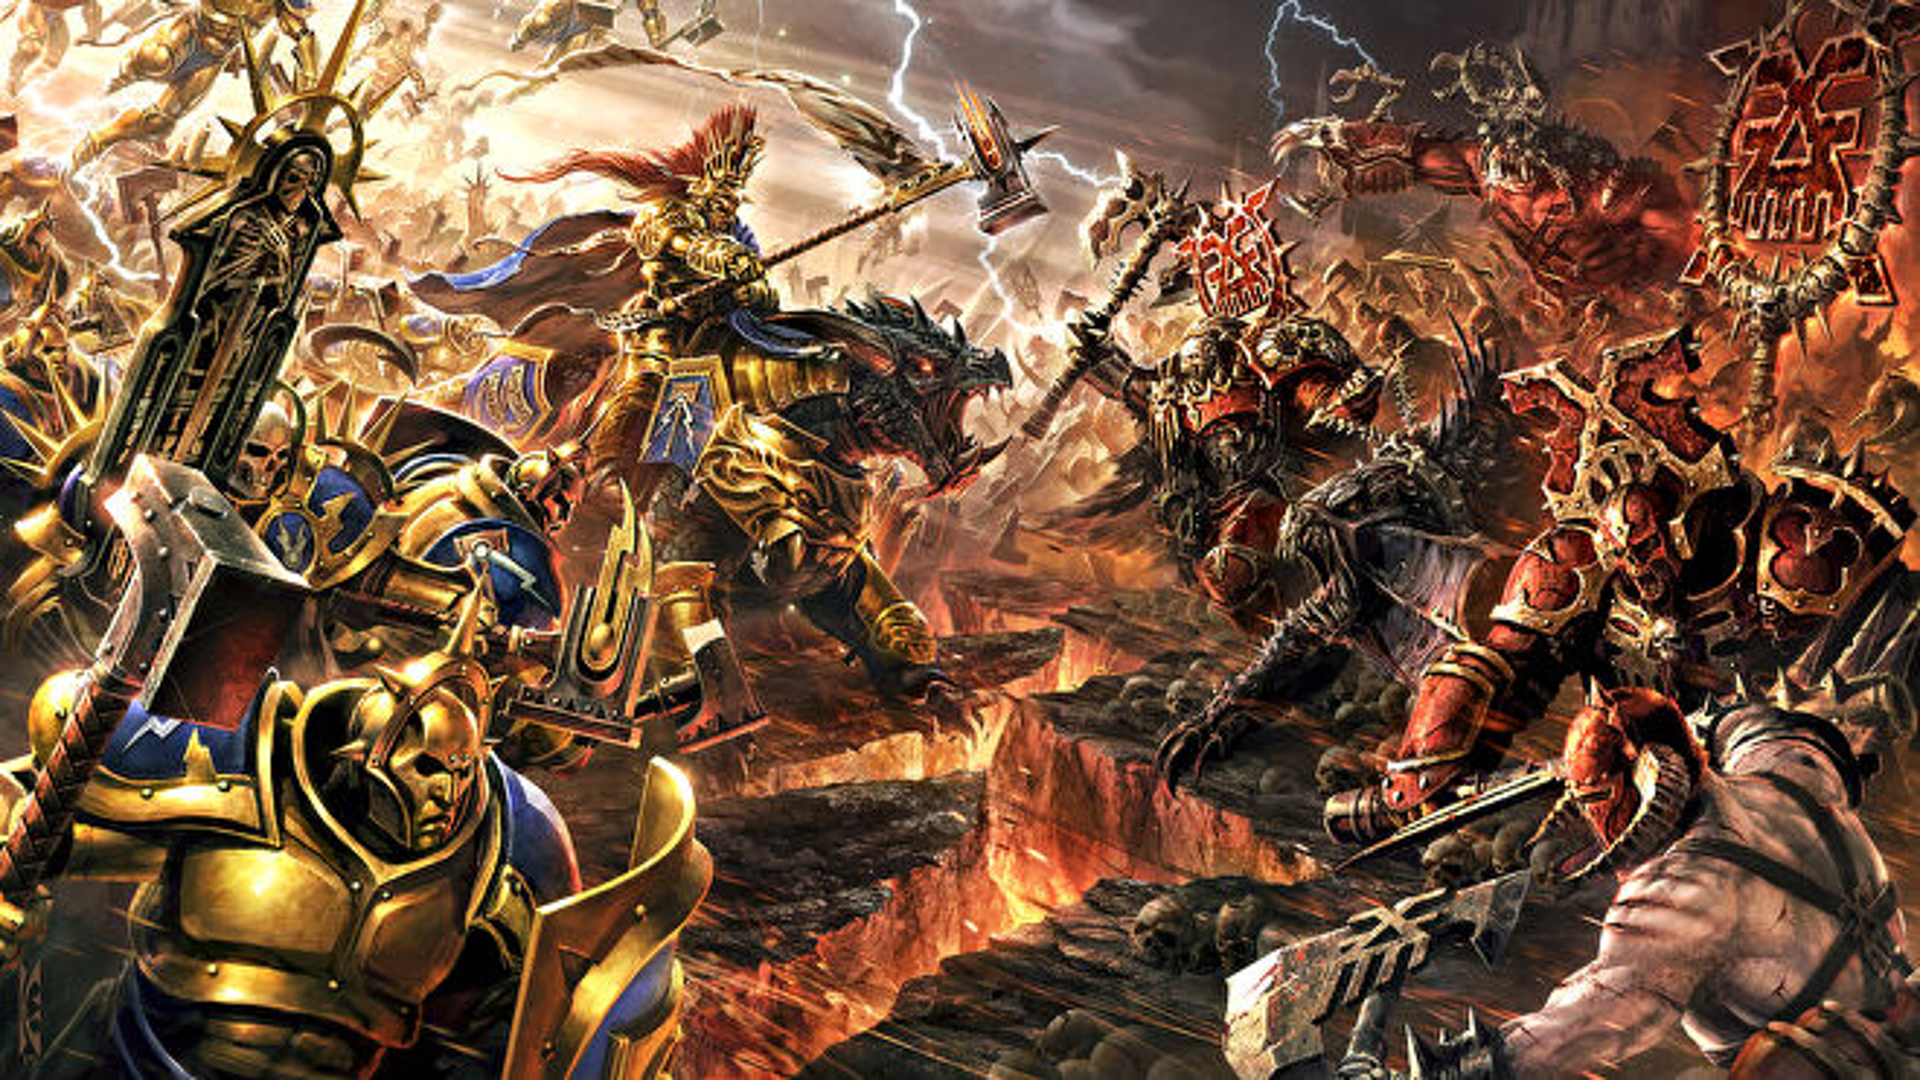 warhammer-age-of-sigmar-box-artwork.jpg